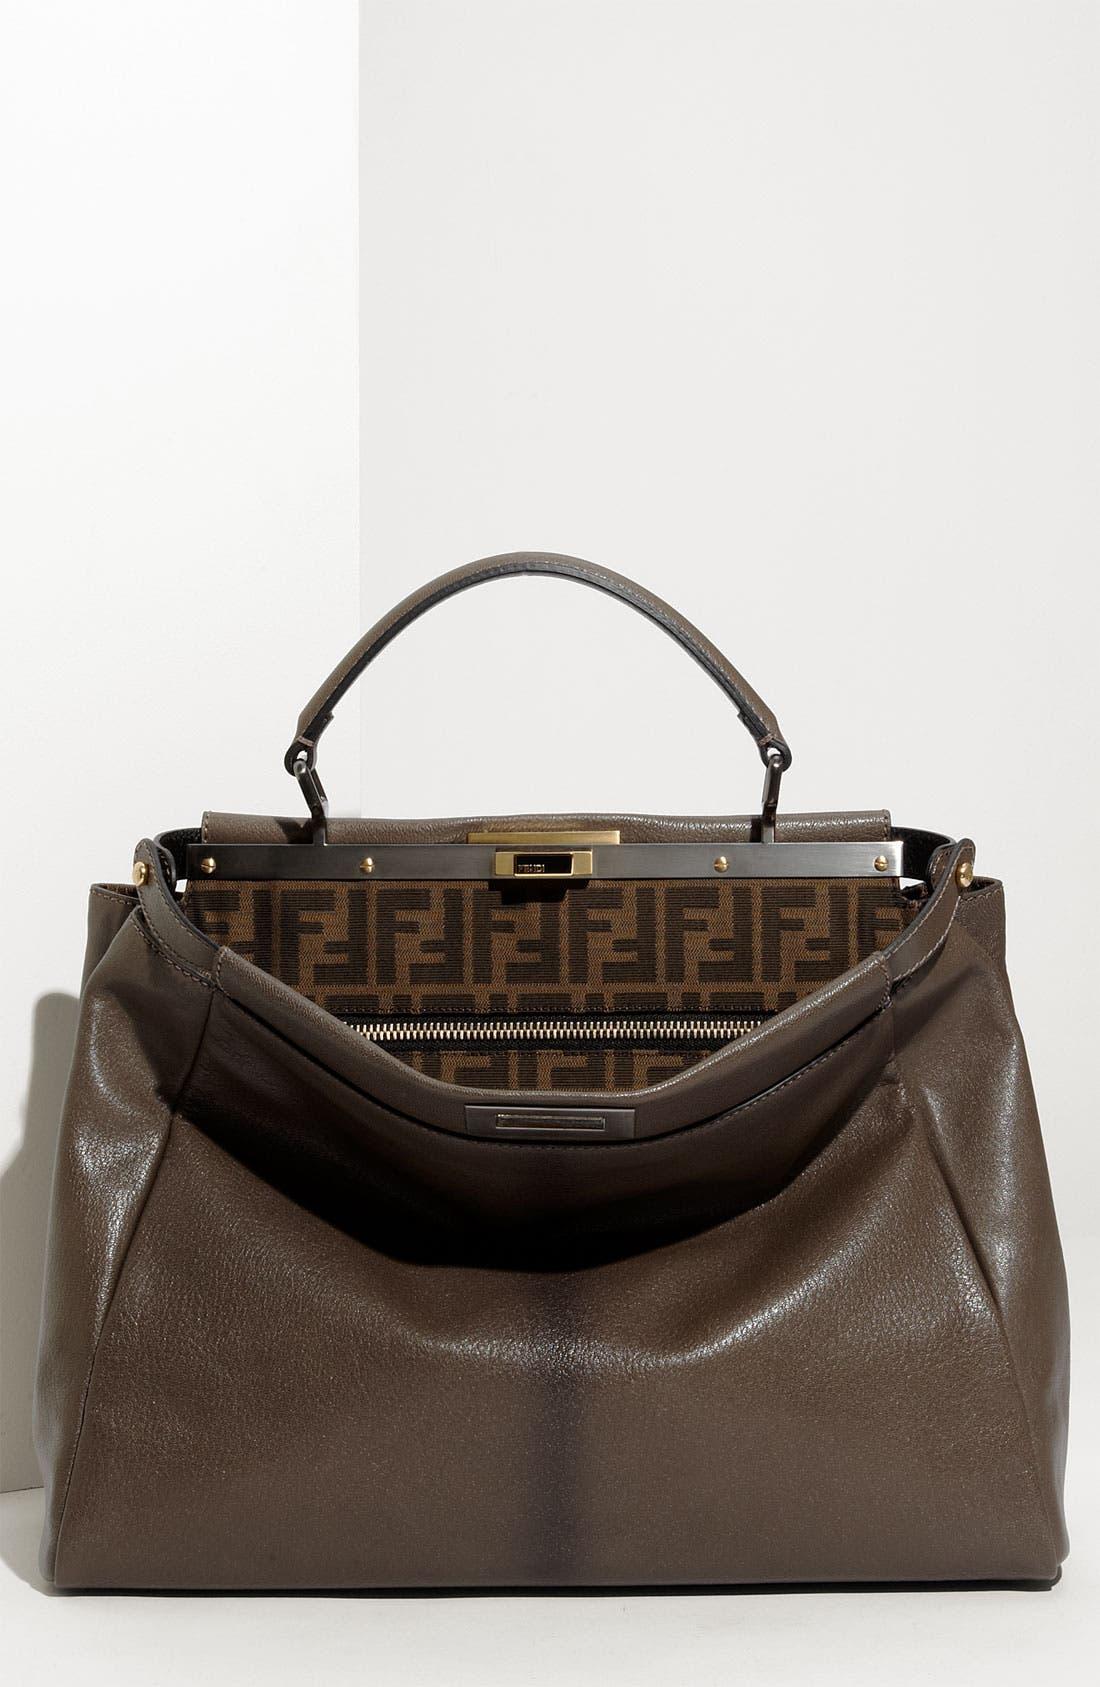 Main Image - Fendi 'Peekaboo - Large' Leather Satchel